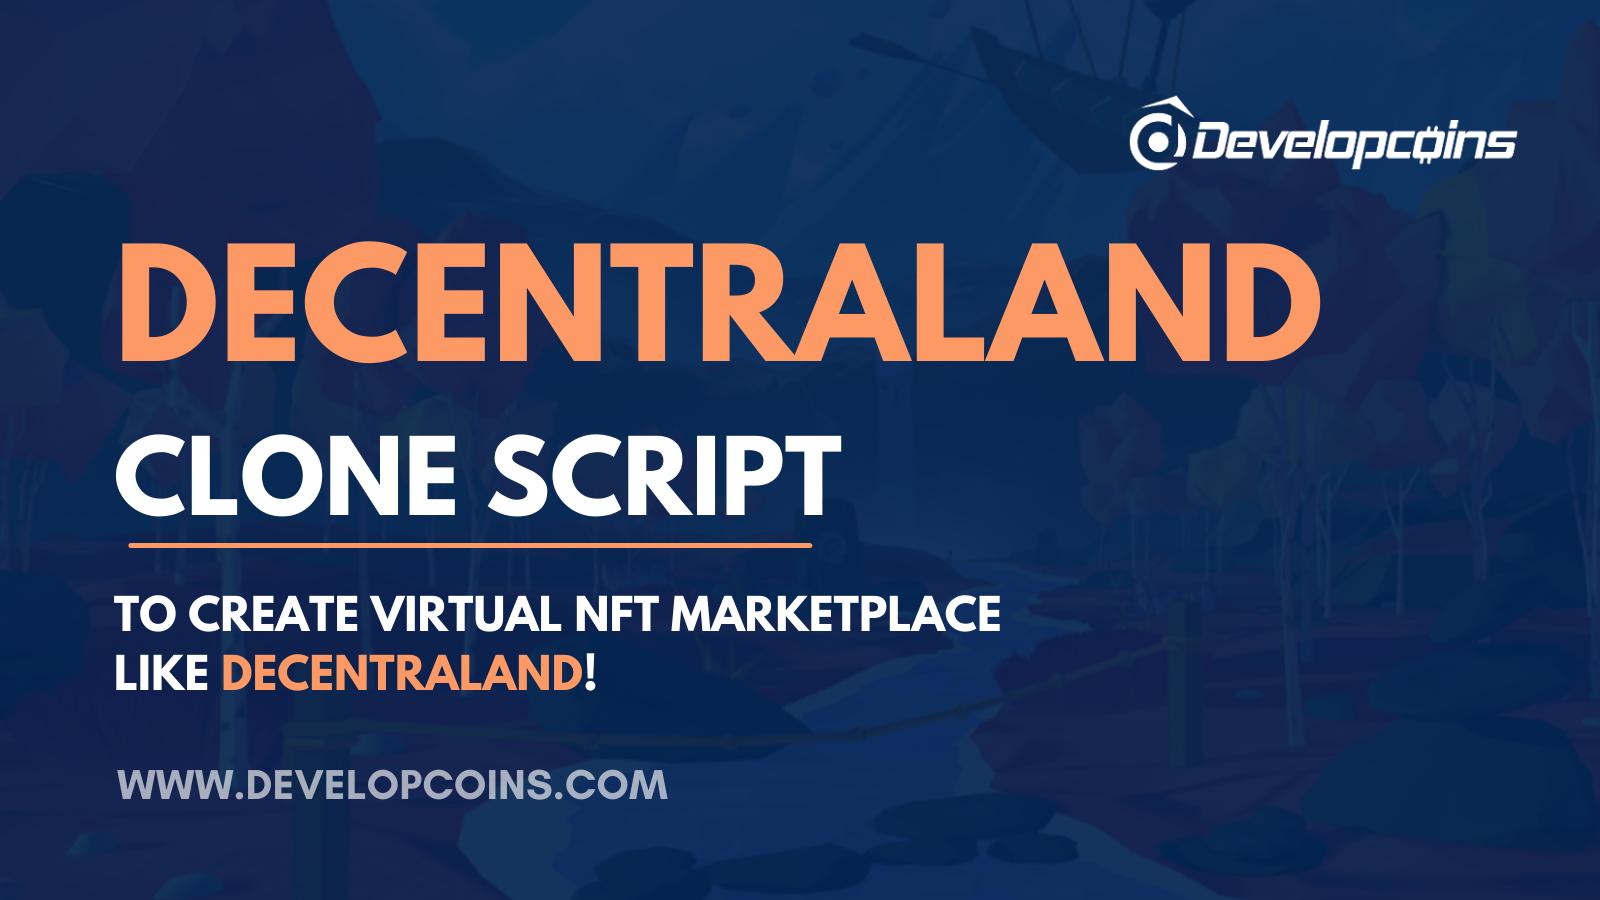 Decentraland Clone Script - To Create Virtual NFT Marketplace like Decentraland.